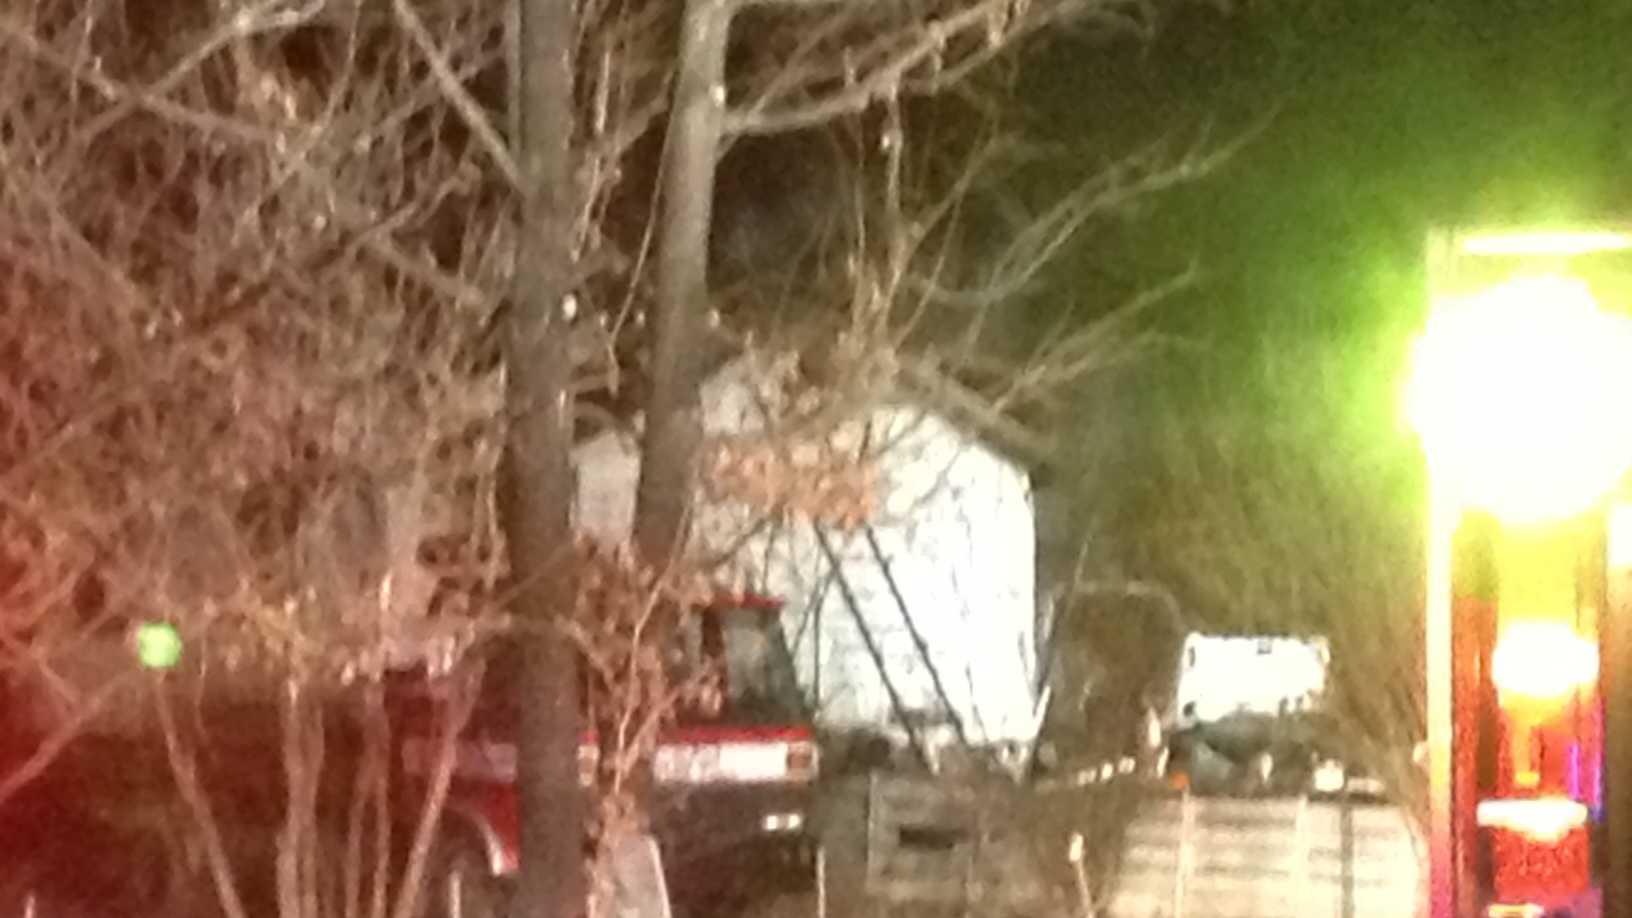 Craig Greensboro fire photo